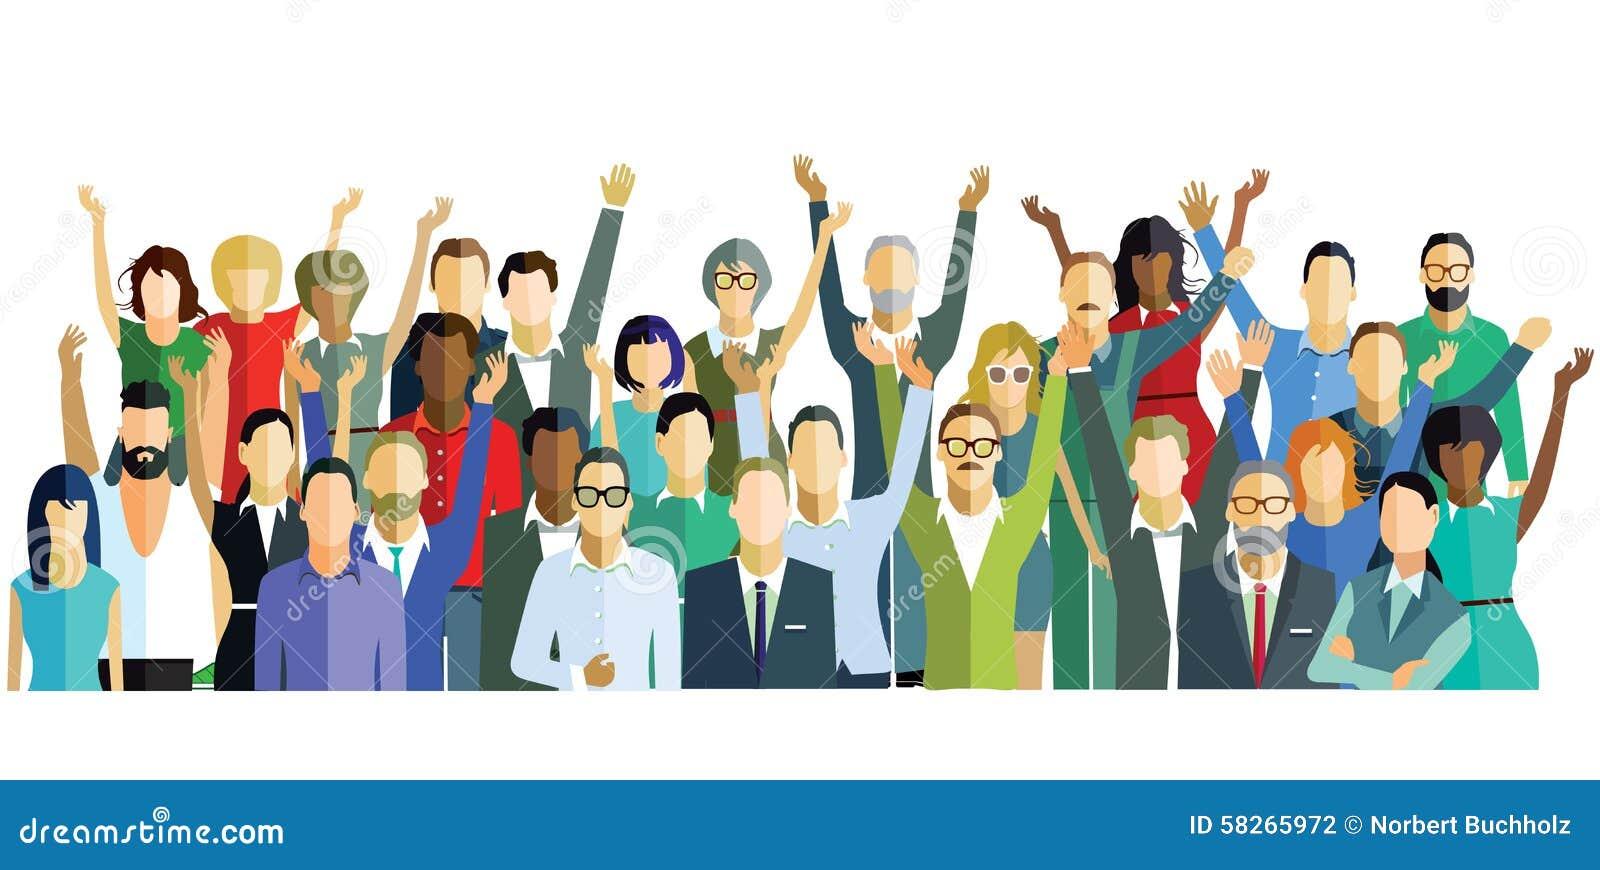 Dieta Pra Ficar mais gordo De modo Saudável happy-group-people-illustration-raising-their-hands-air-joy-happiness-58265972